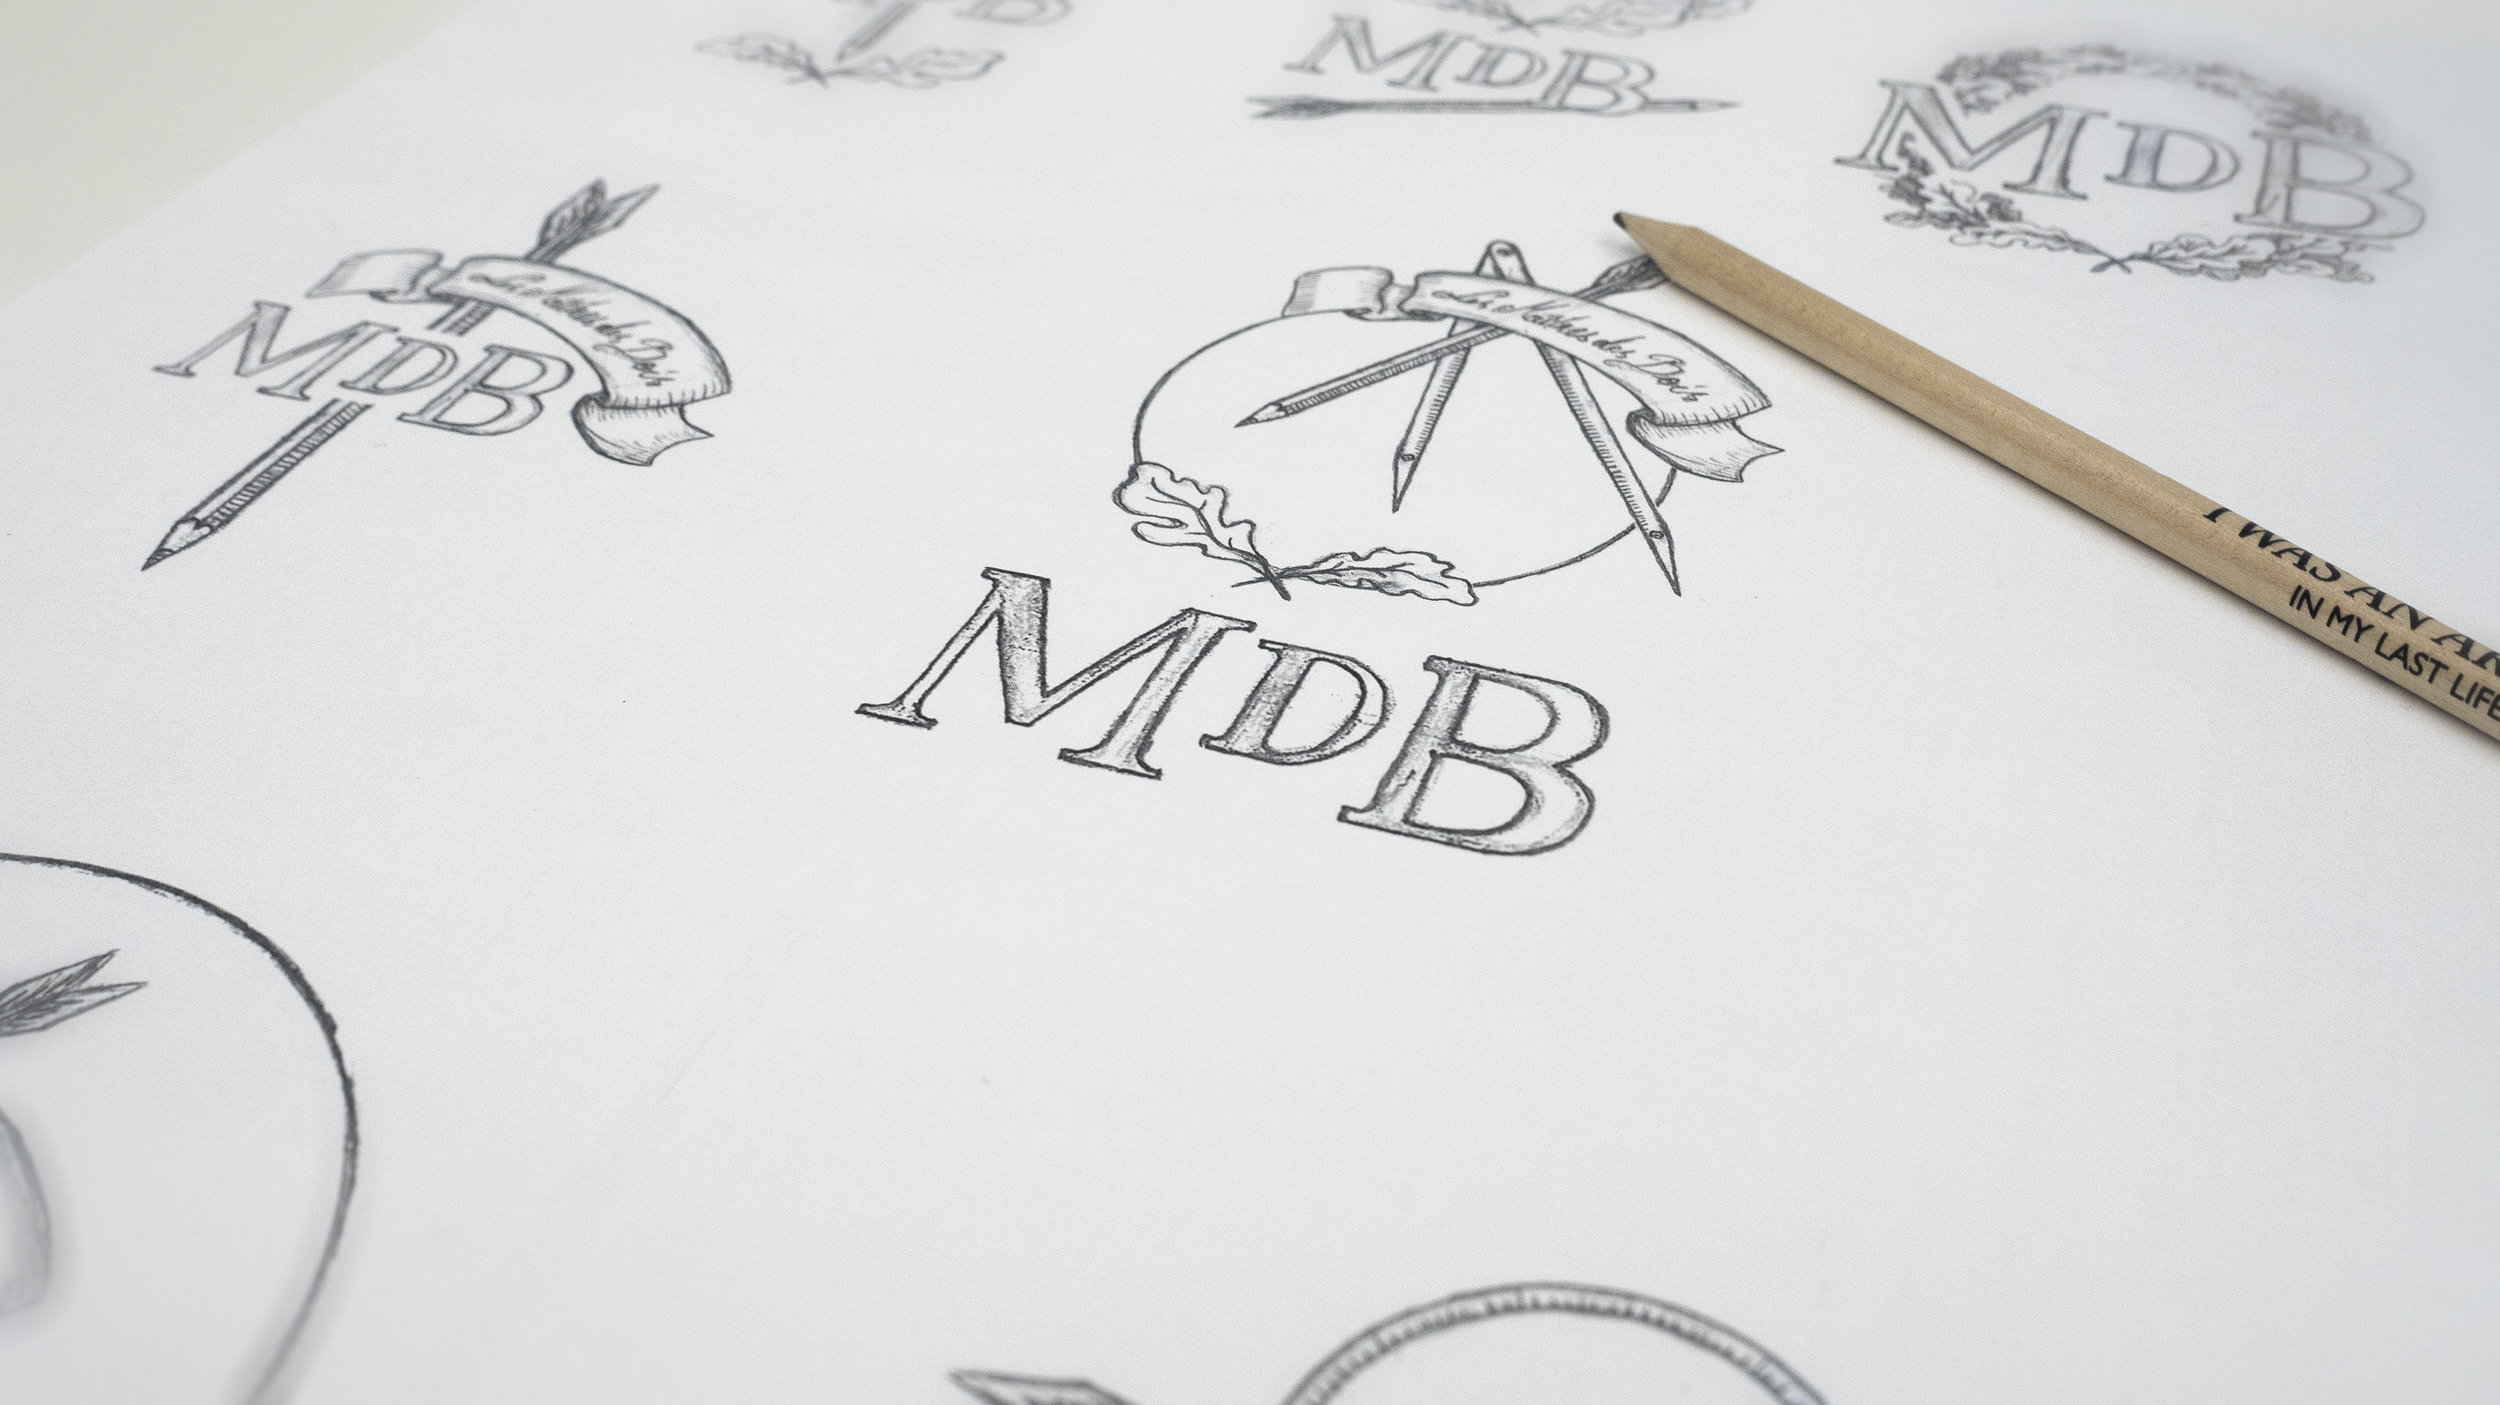 mdb early logo 2.jpg